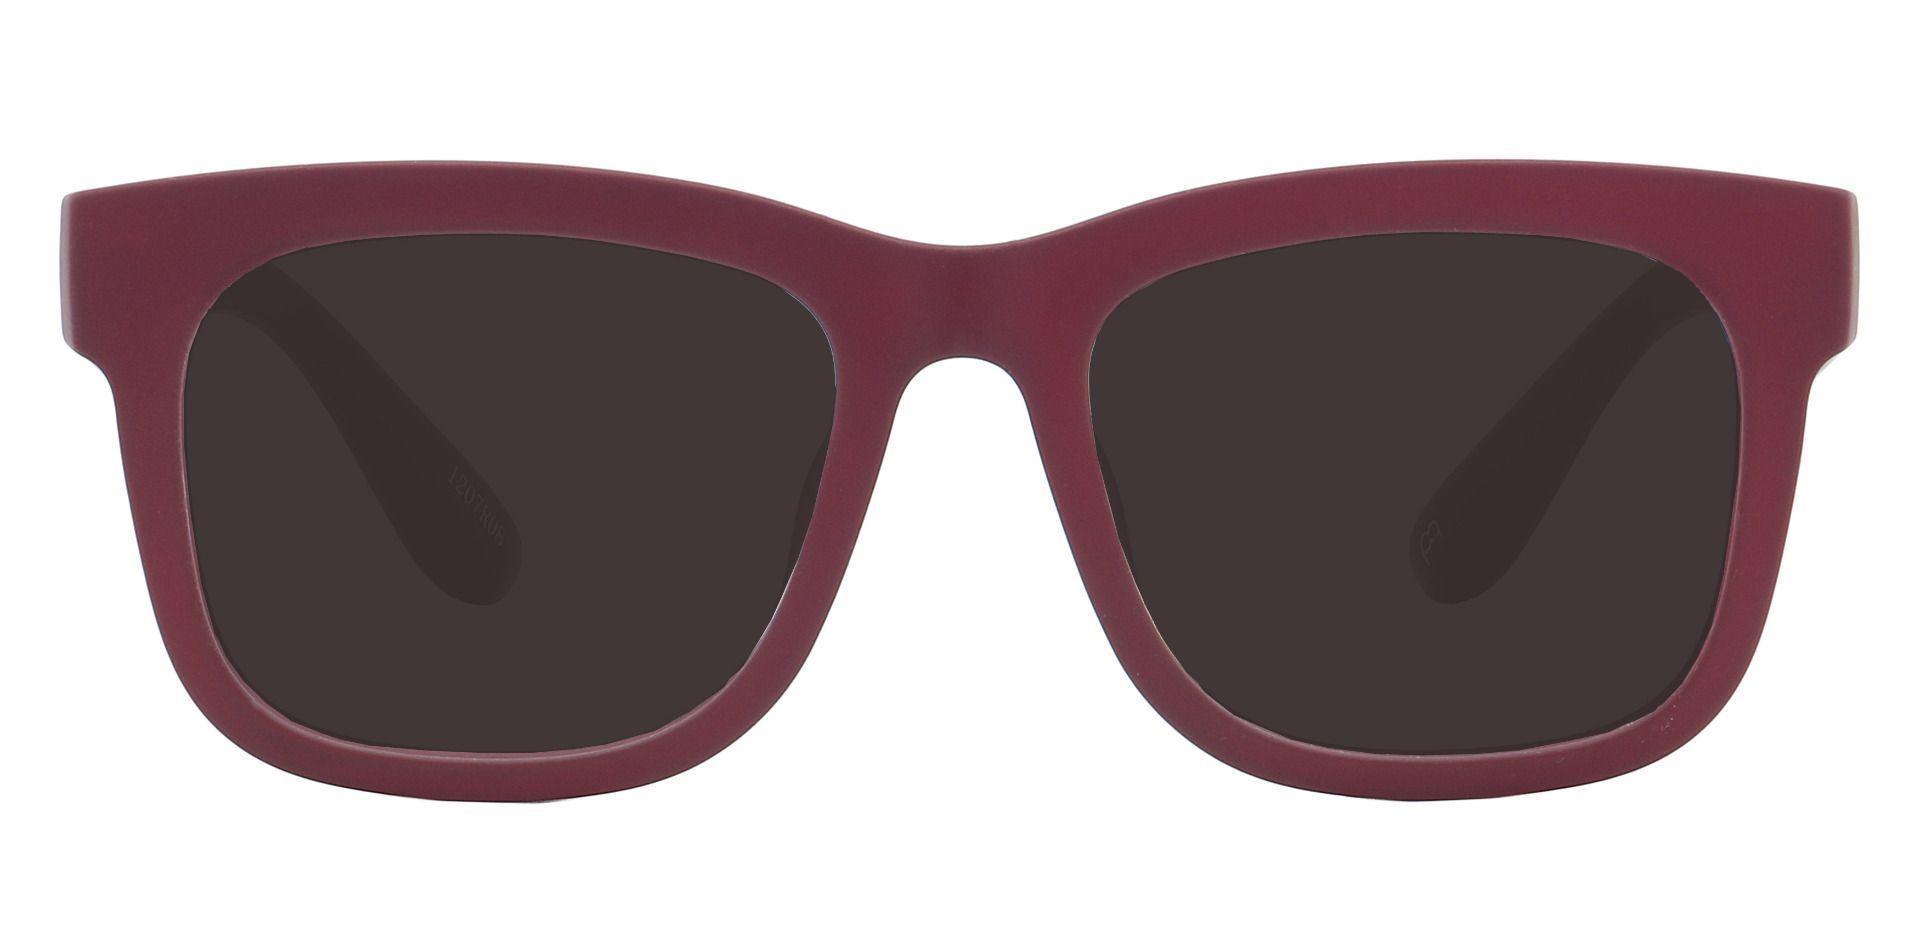 Daphne Square Prescription Sunglasses - Red Frame With Gray Lenses